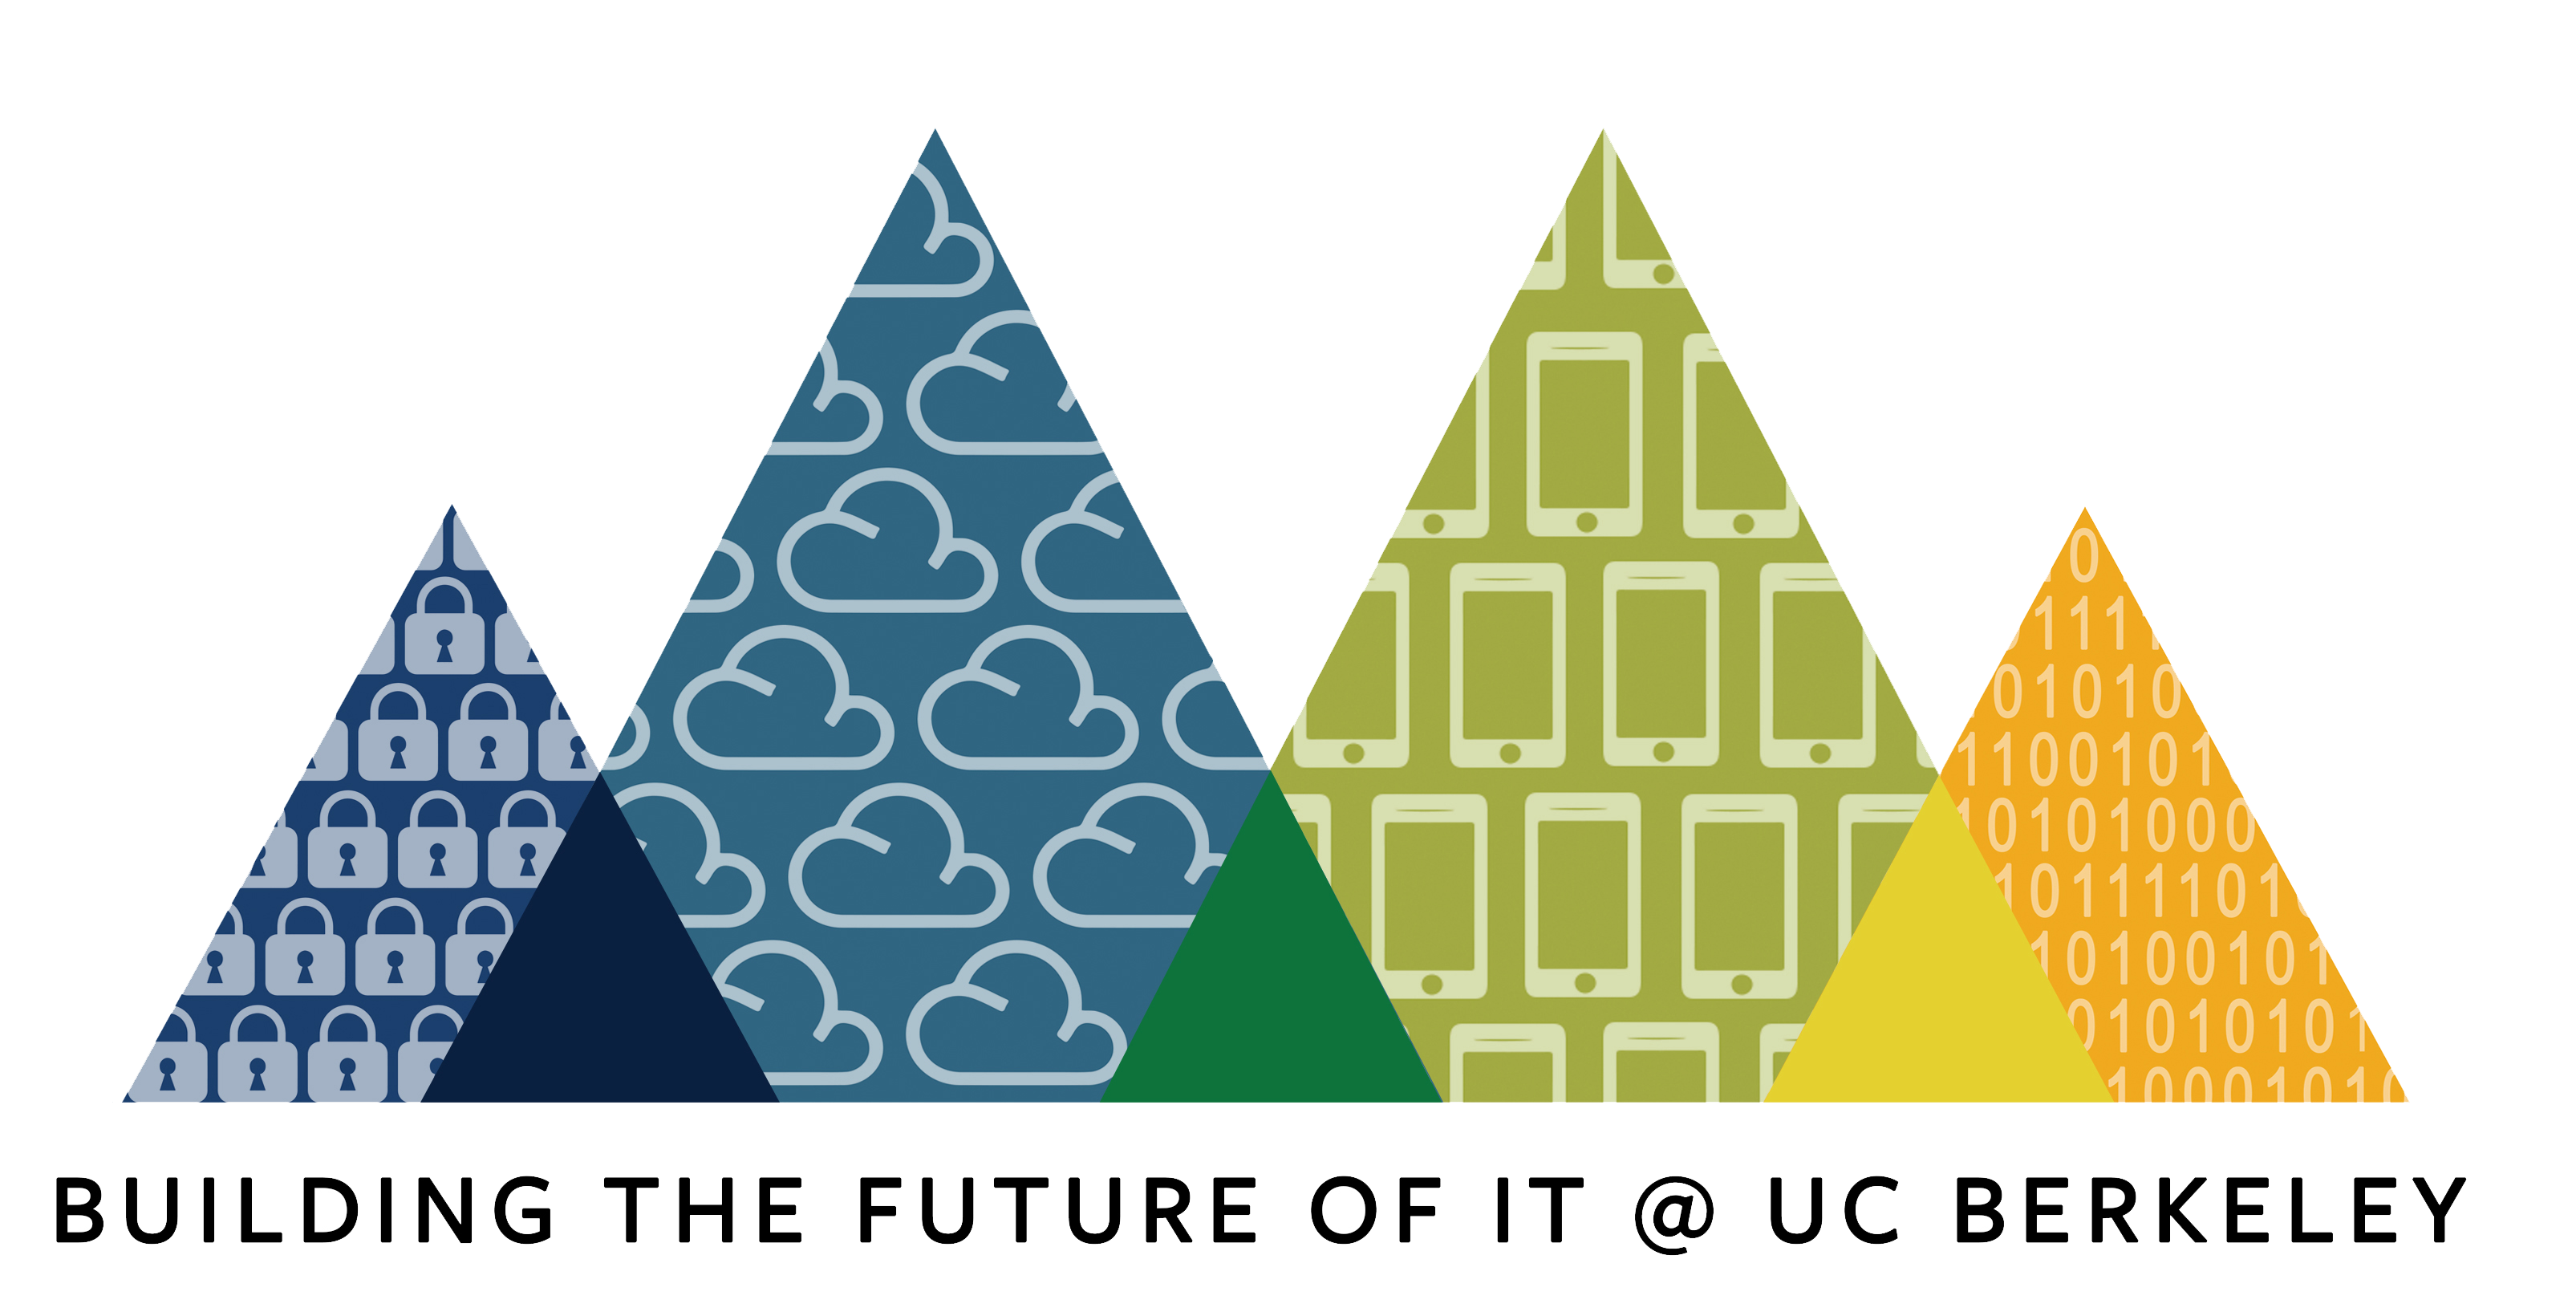 IT Summit logo